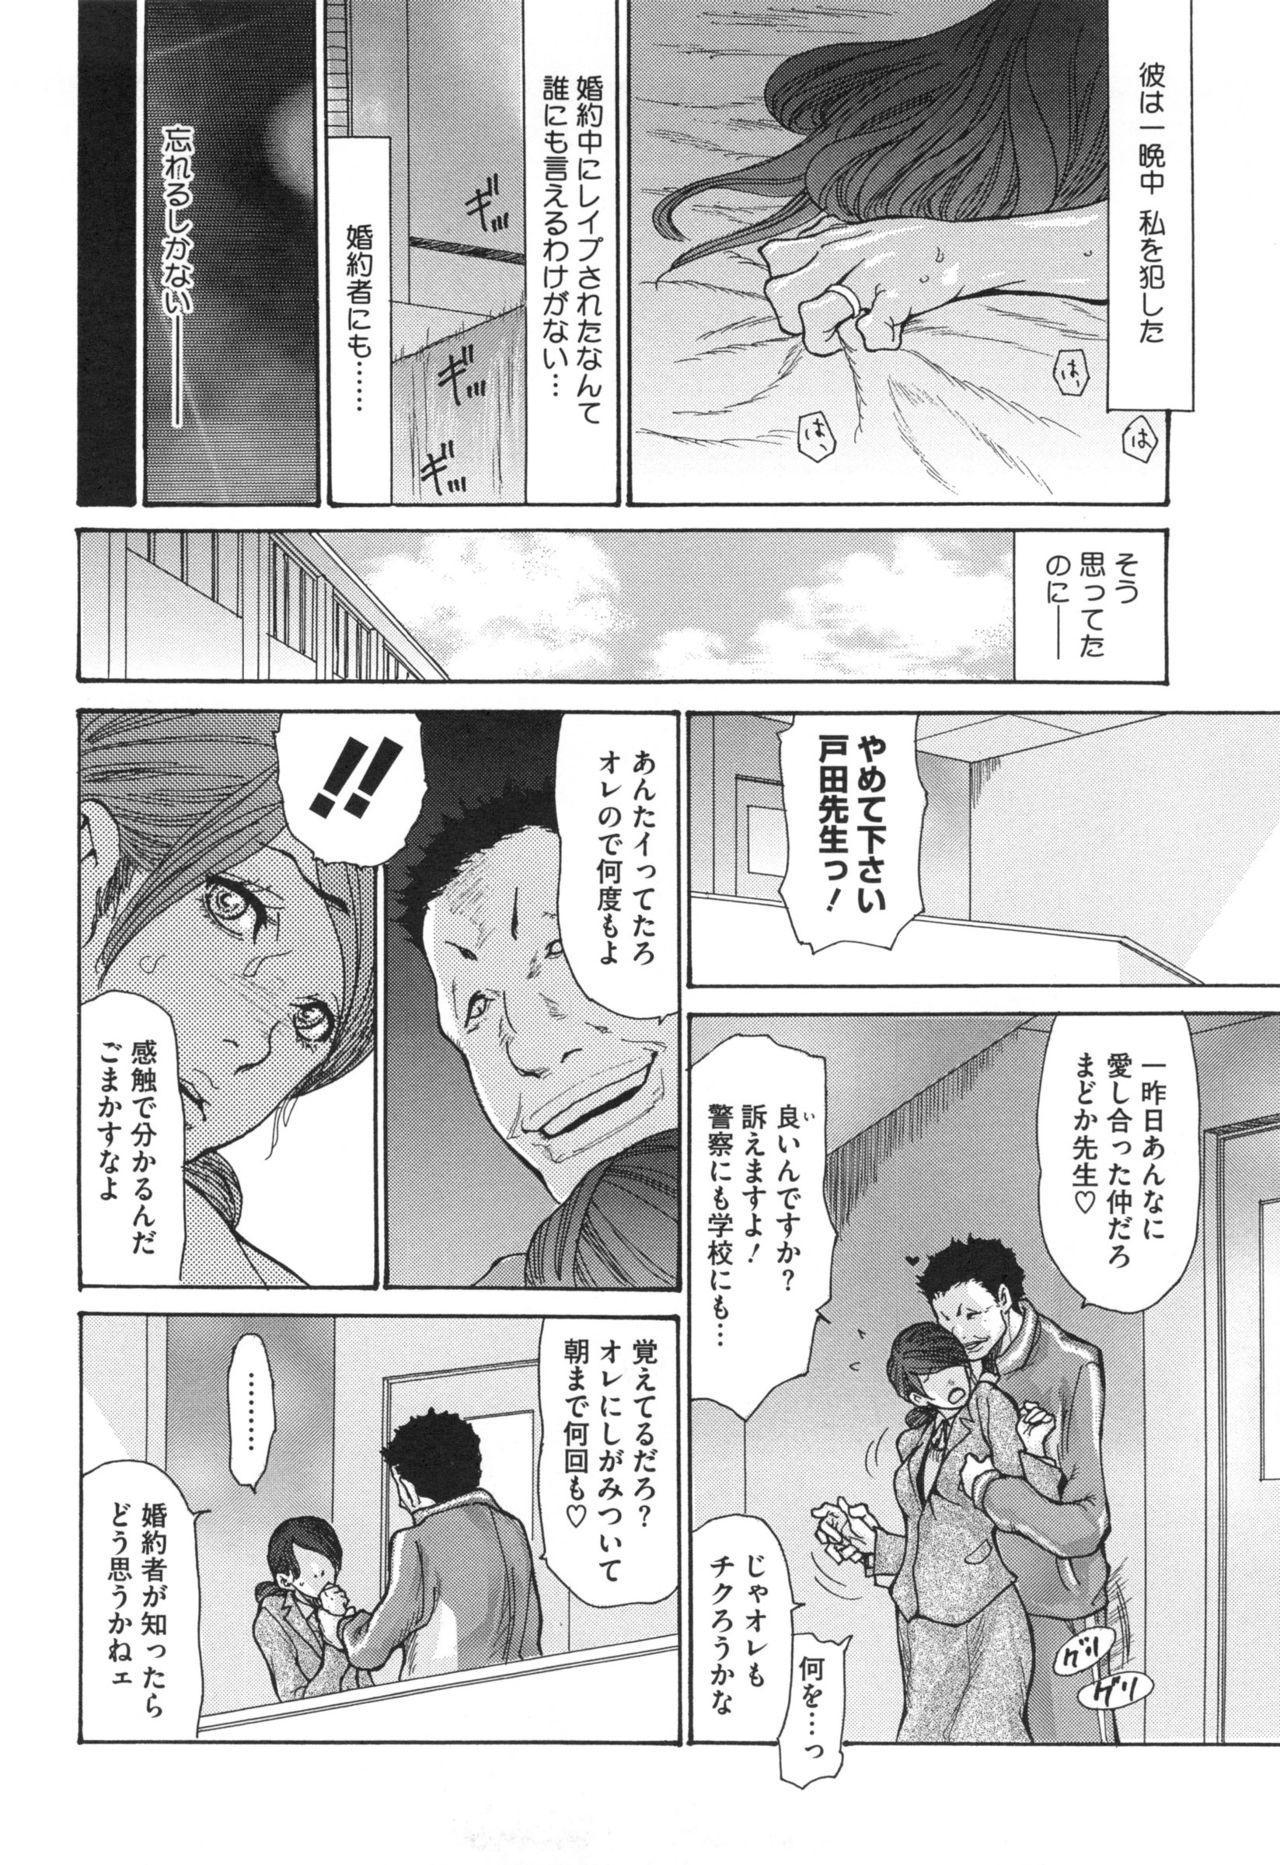 Niku-zuma Netorare Maniacs 54